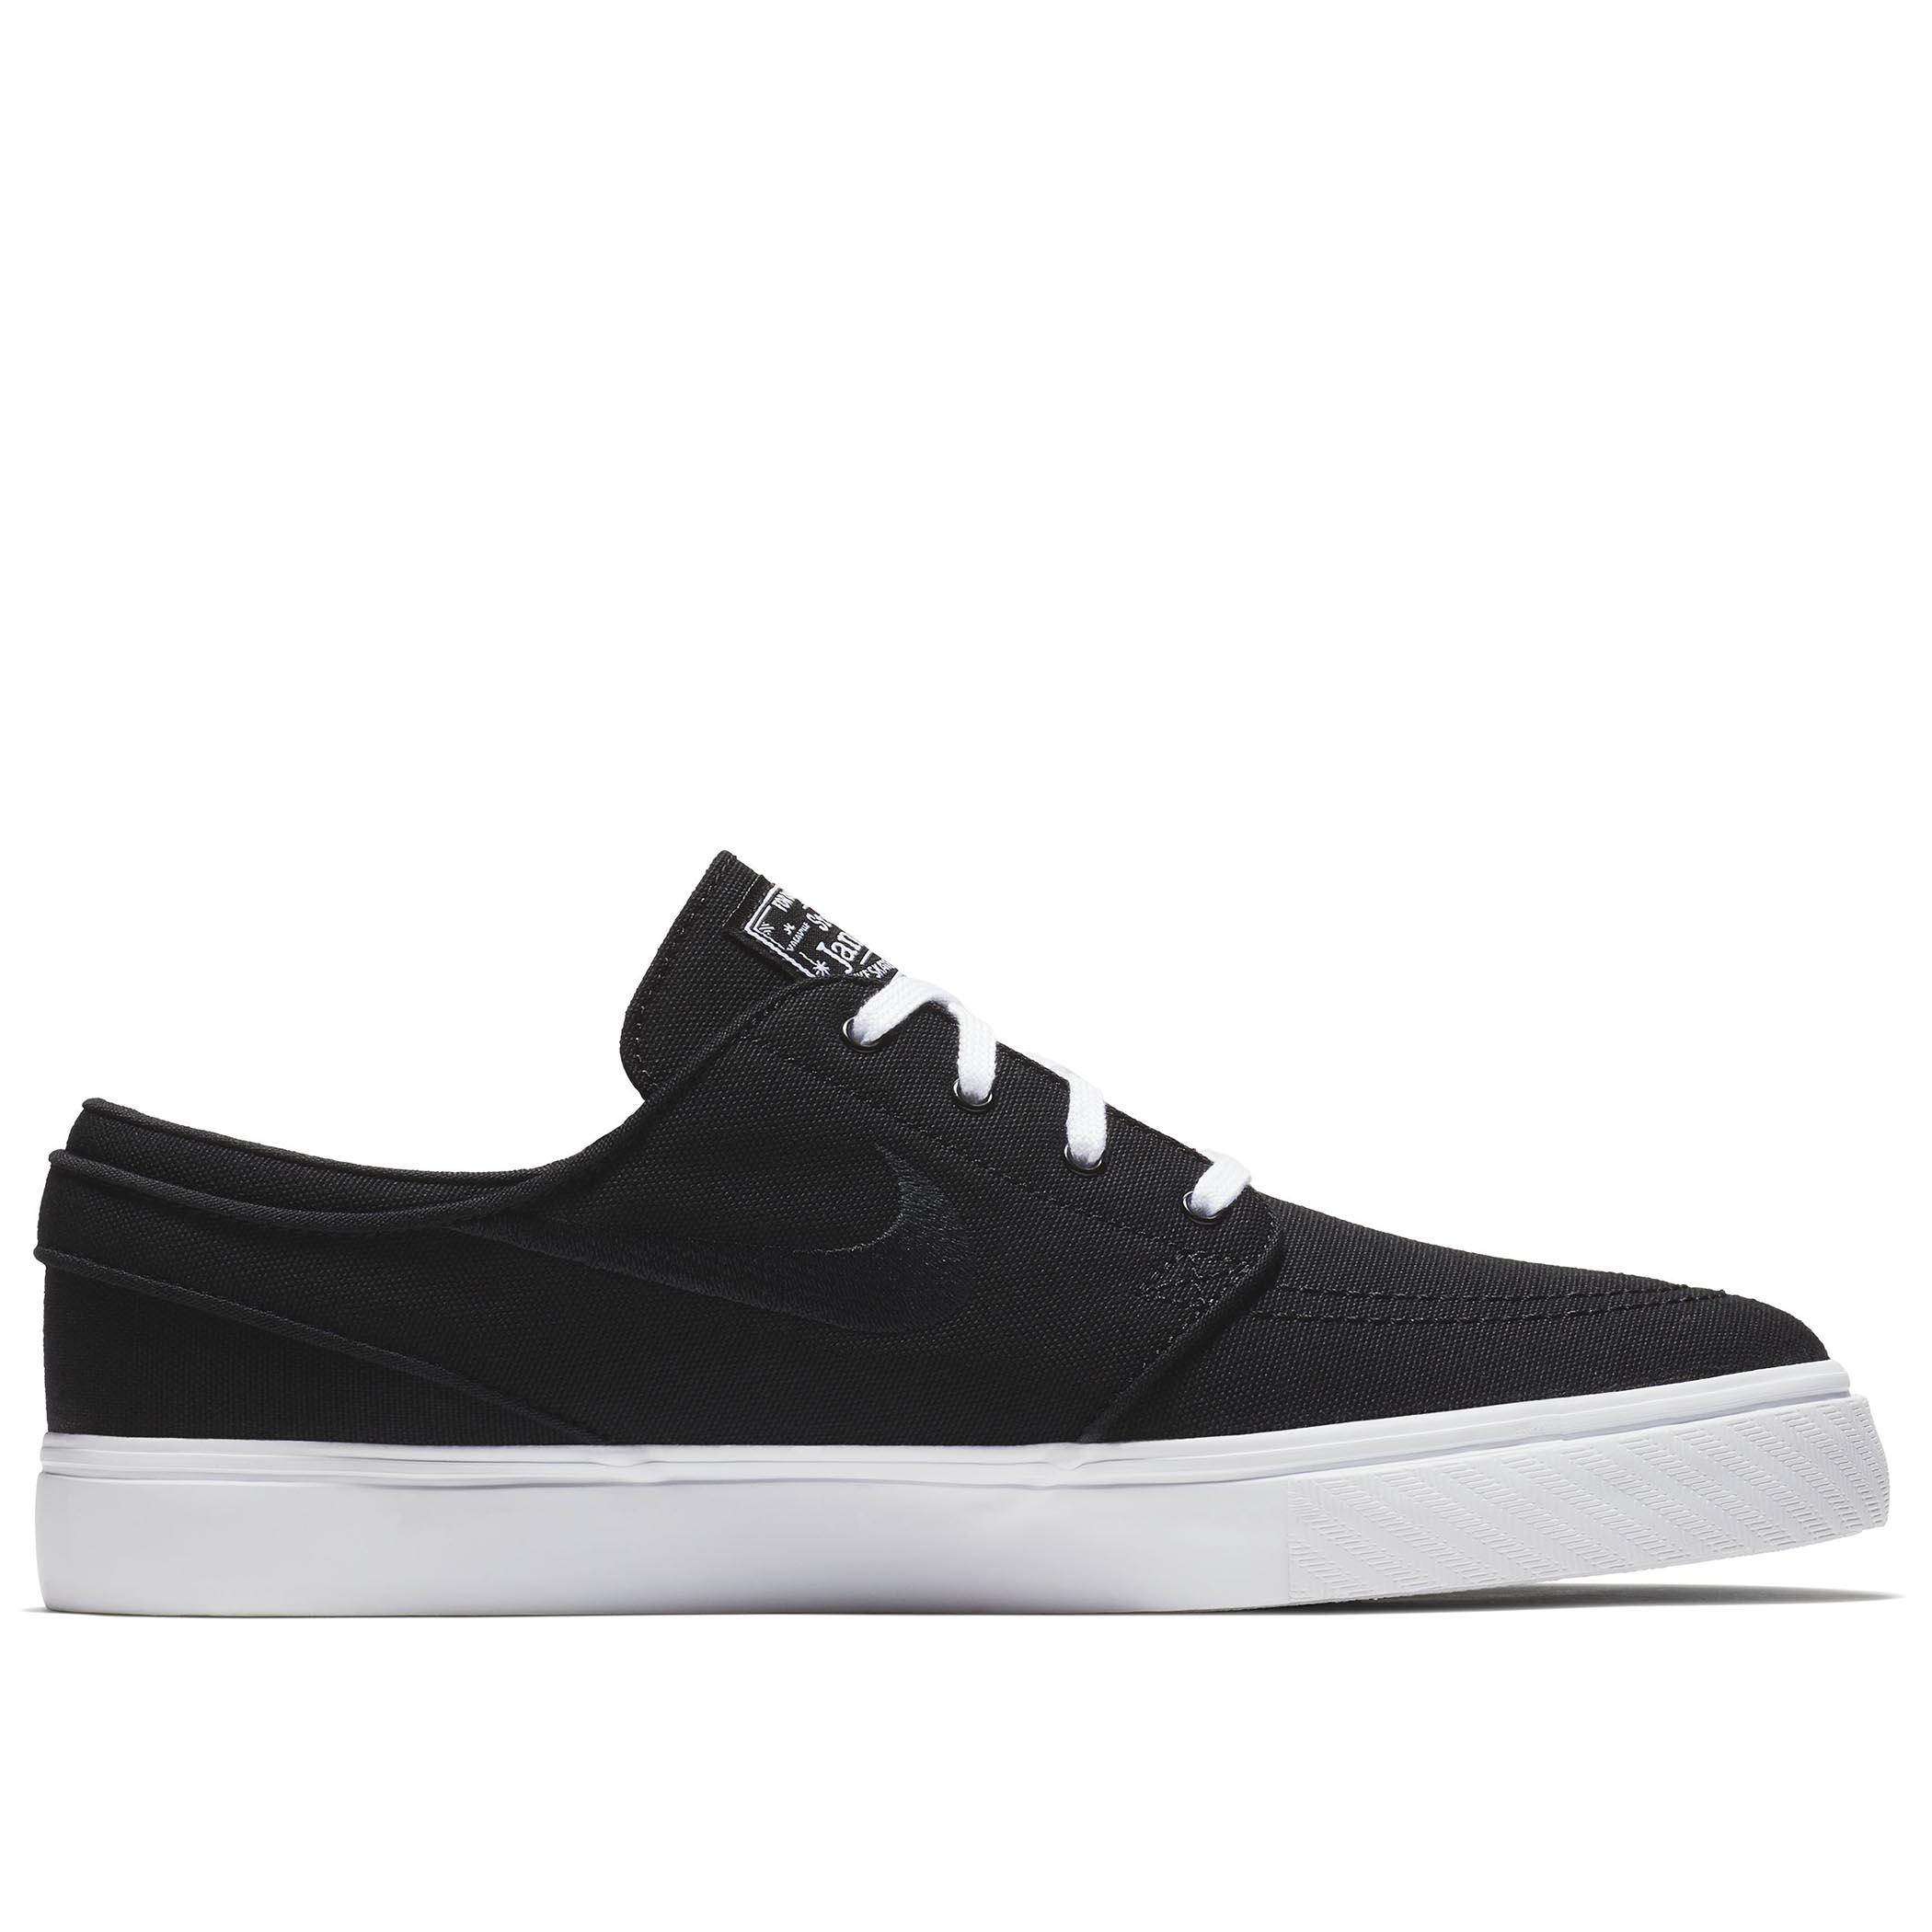 promo code 997f8 ae4dc Мужские кеды Nike SB Zoom Stefan Janoski Canvas Black Black-White - фото 6